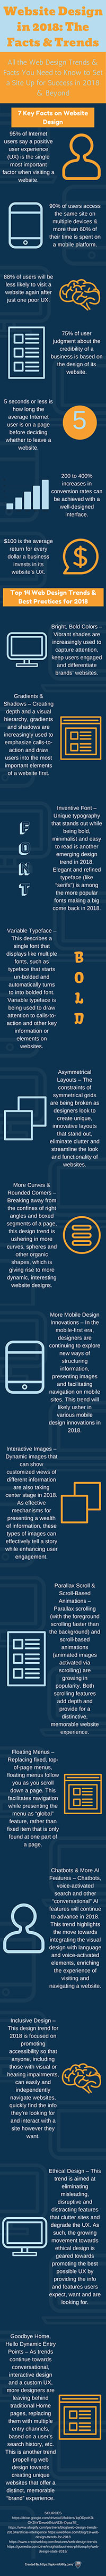 Web-Design-Trends-2018-200